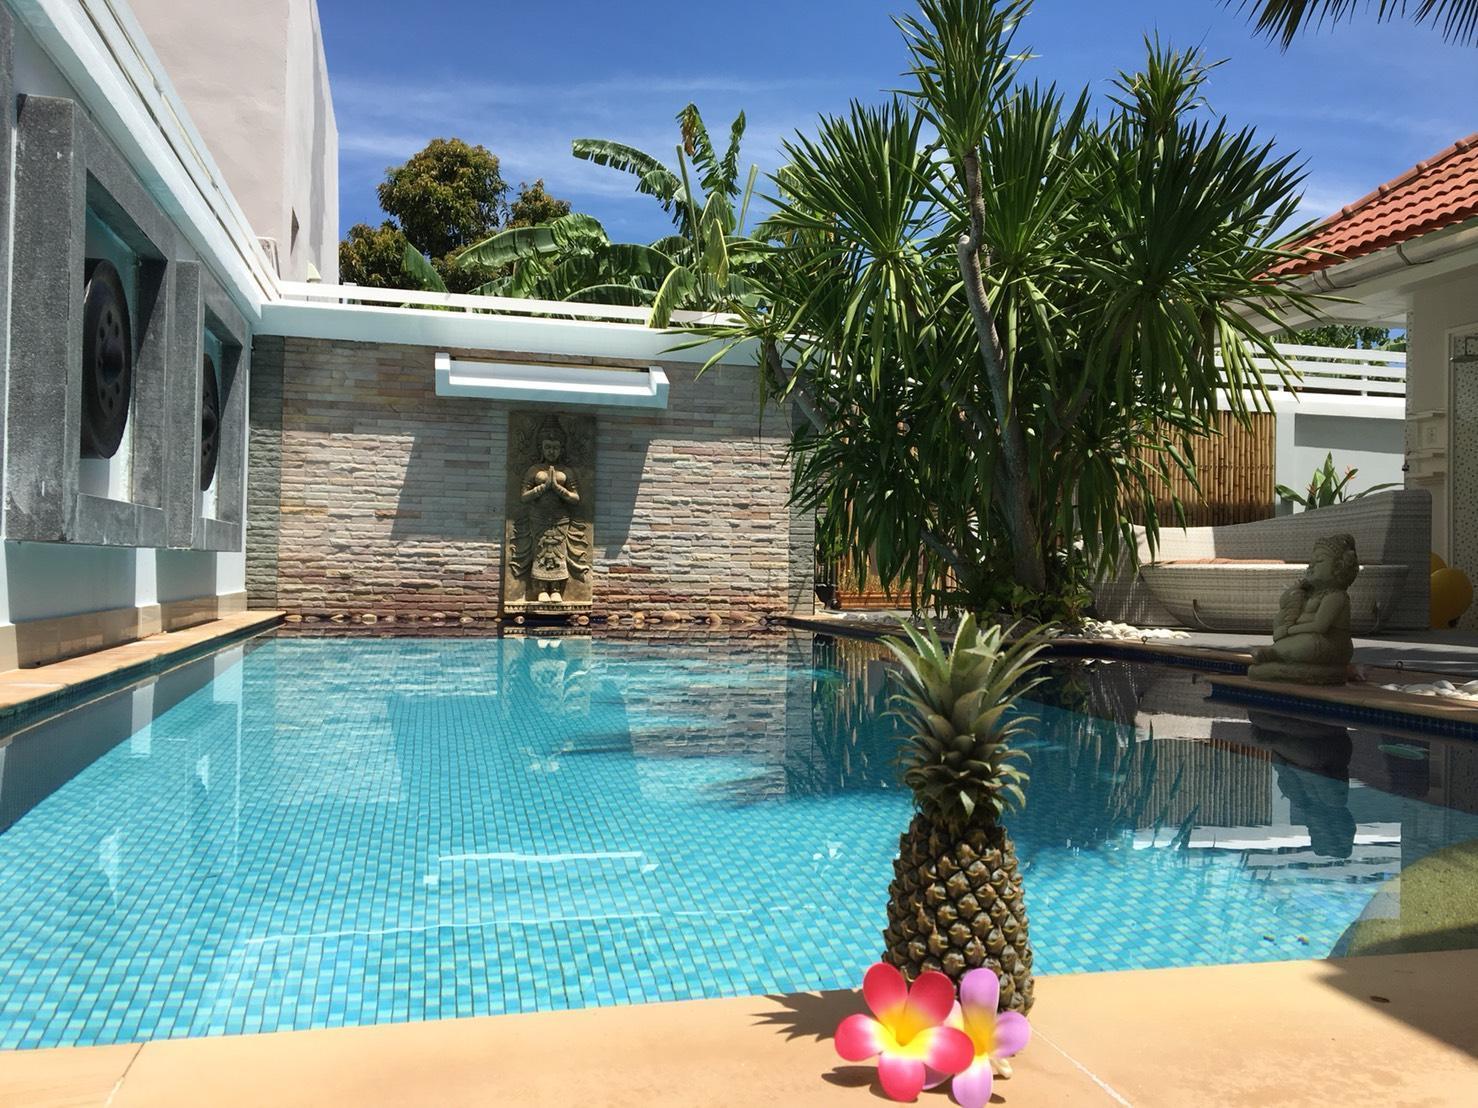 Inaya Pool Villa Rawai Inaya Pool Villa Rawai